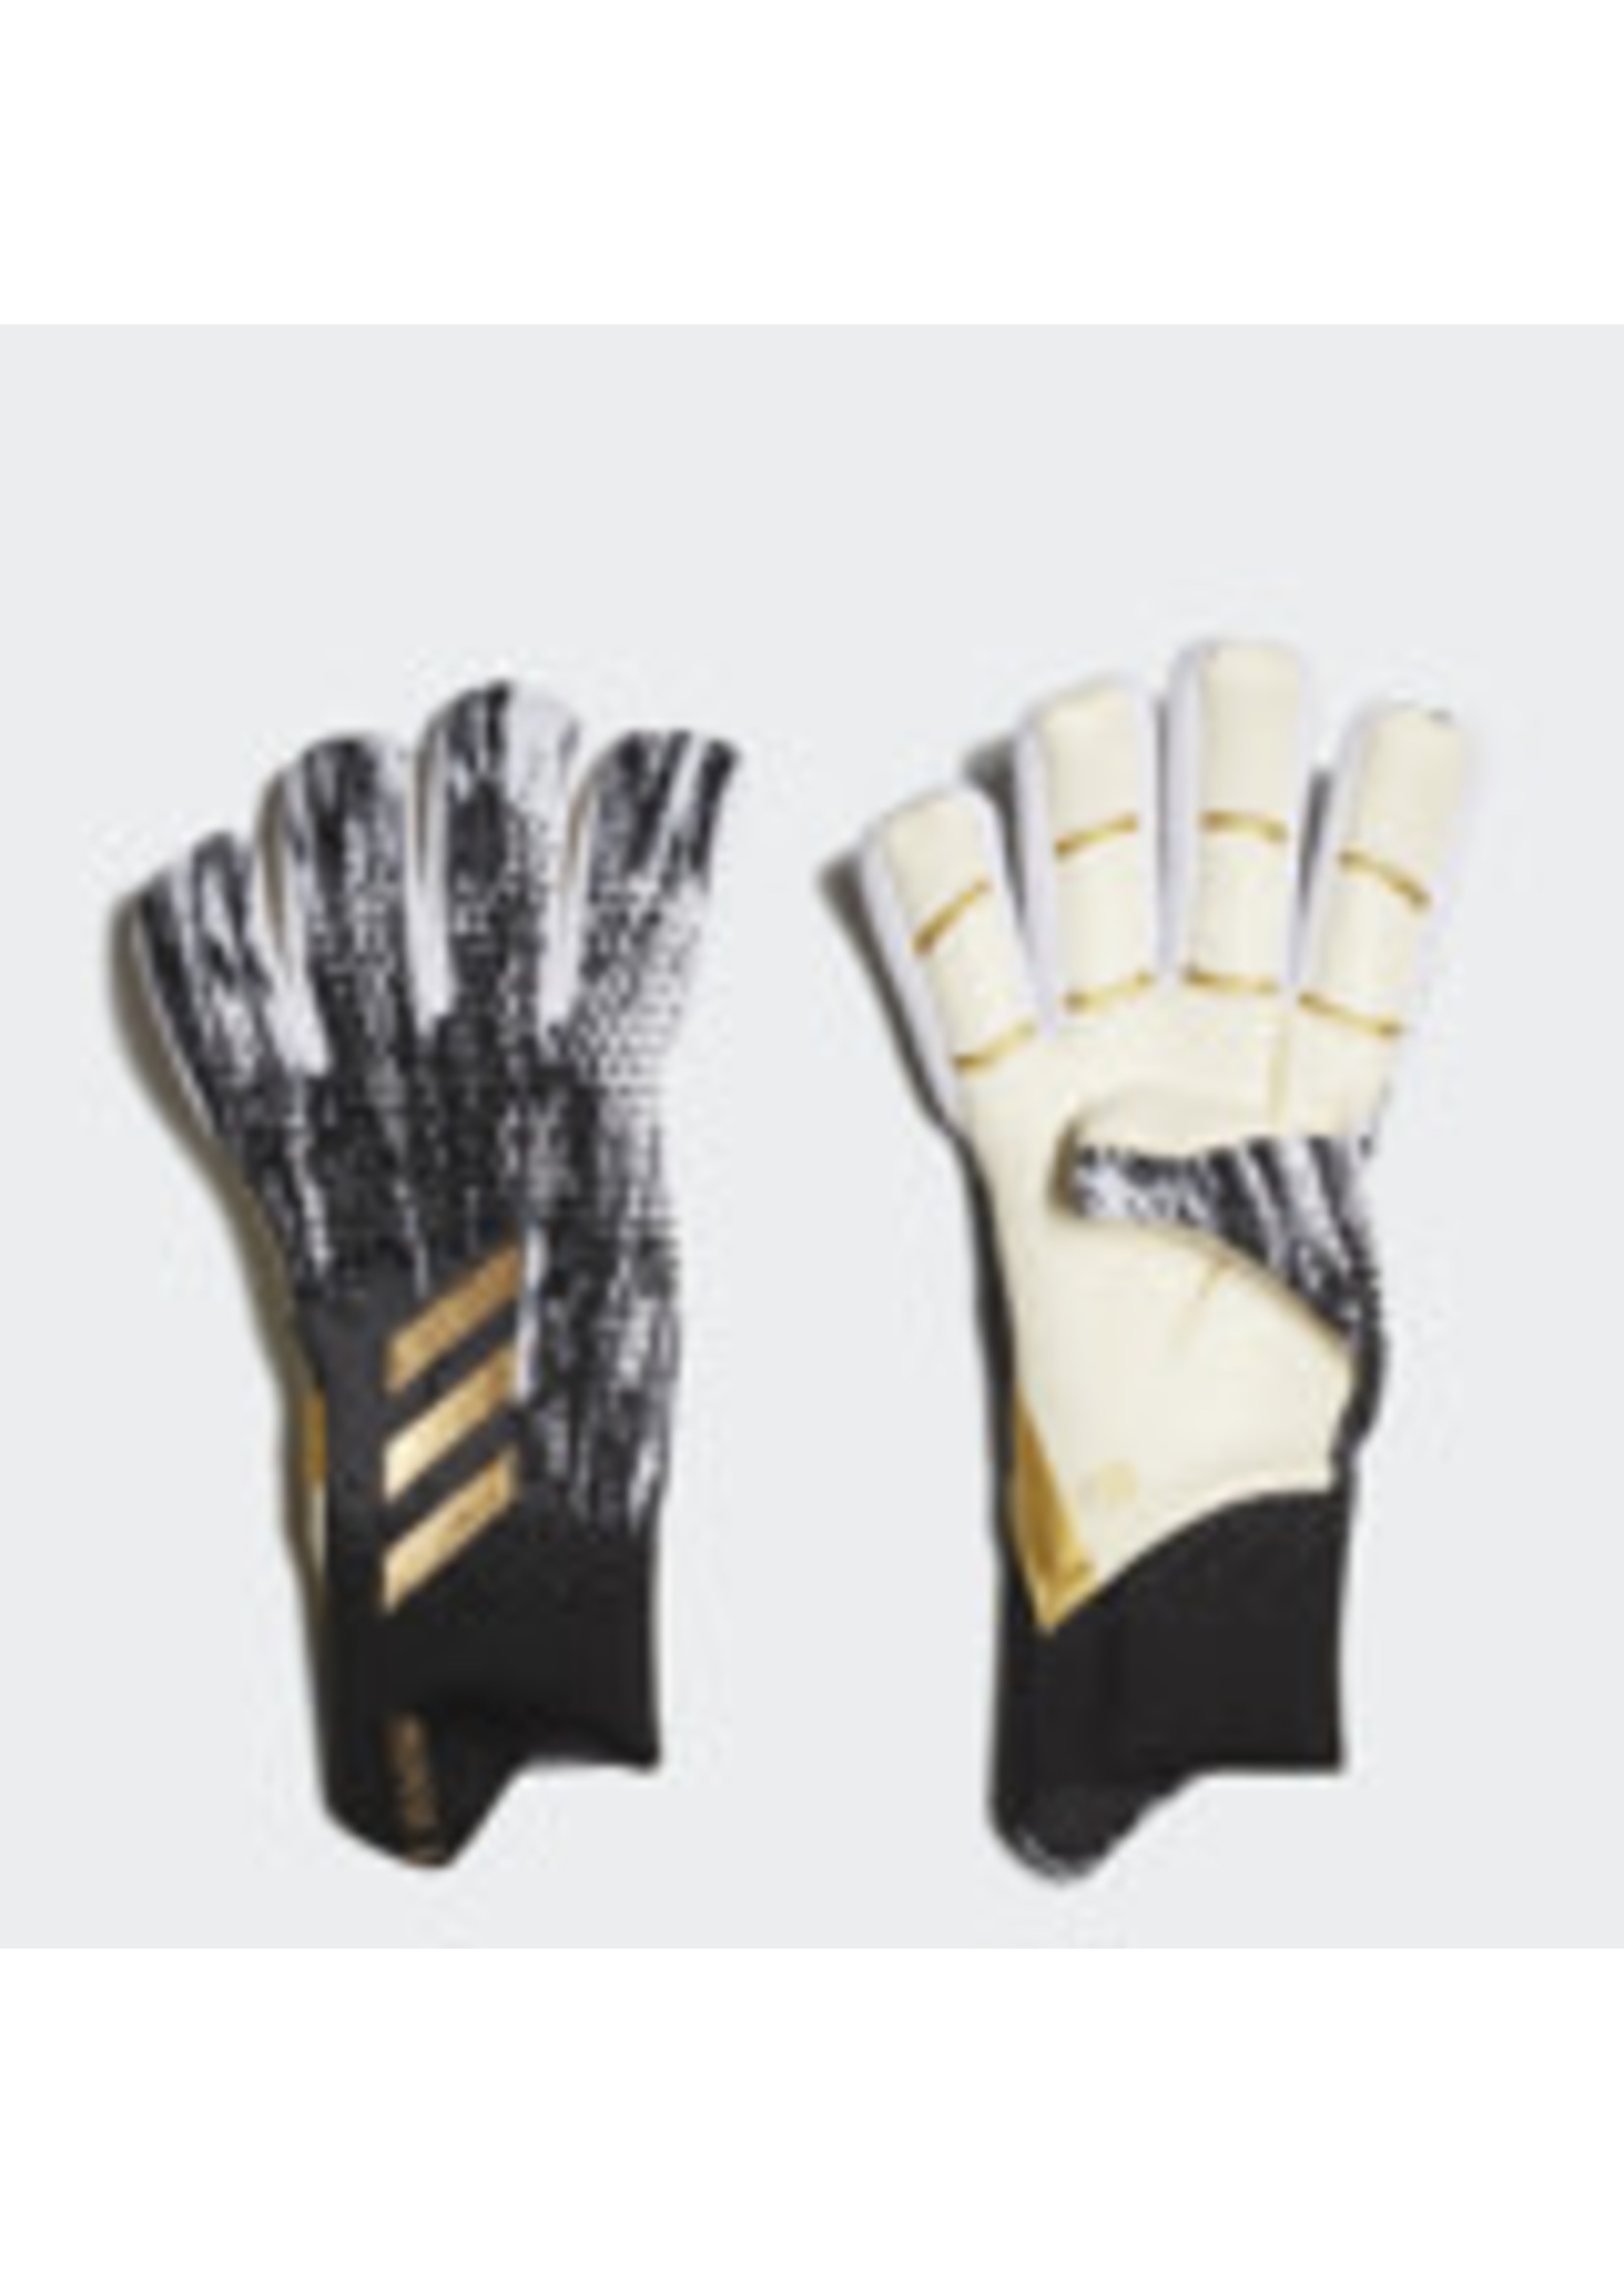 Adidas Predator20 Pro Fingersave